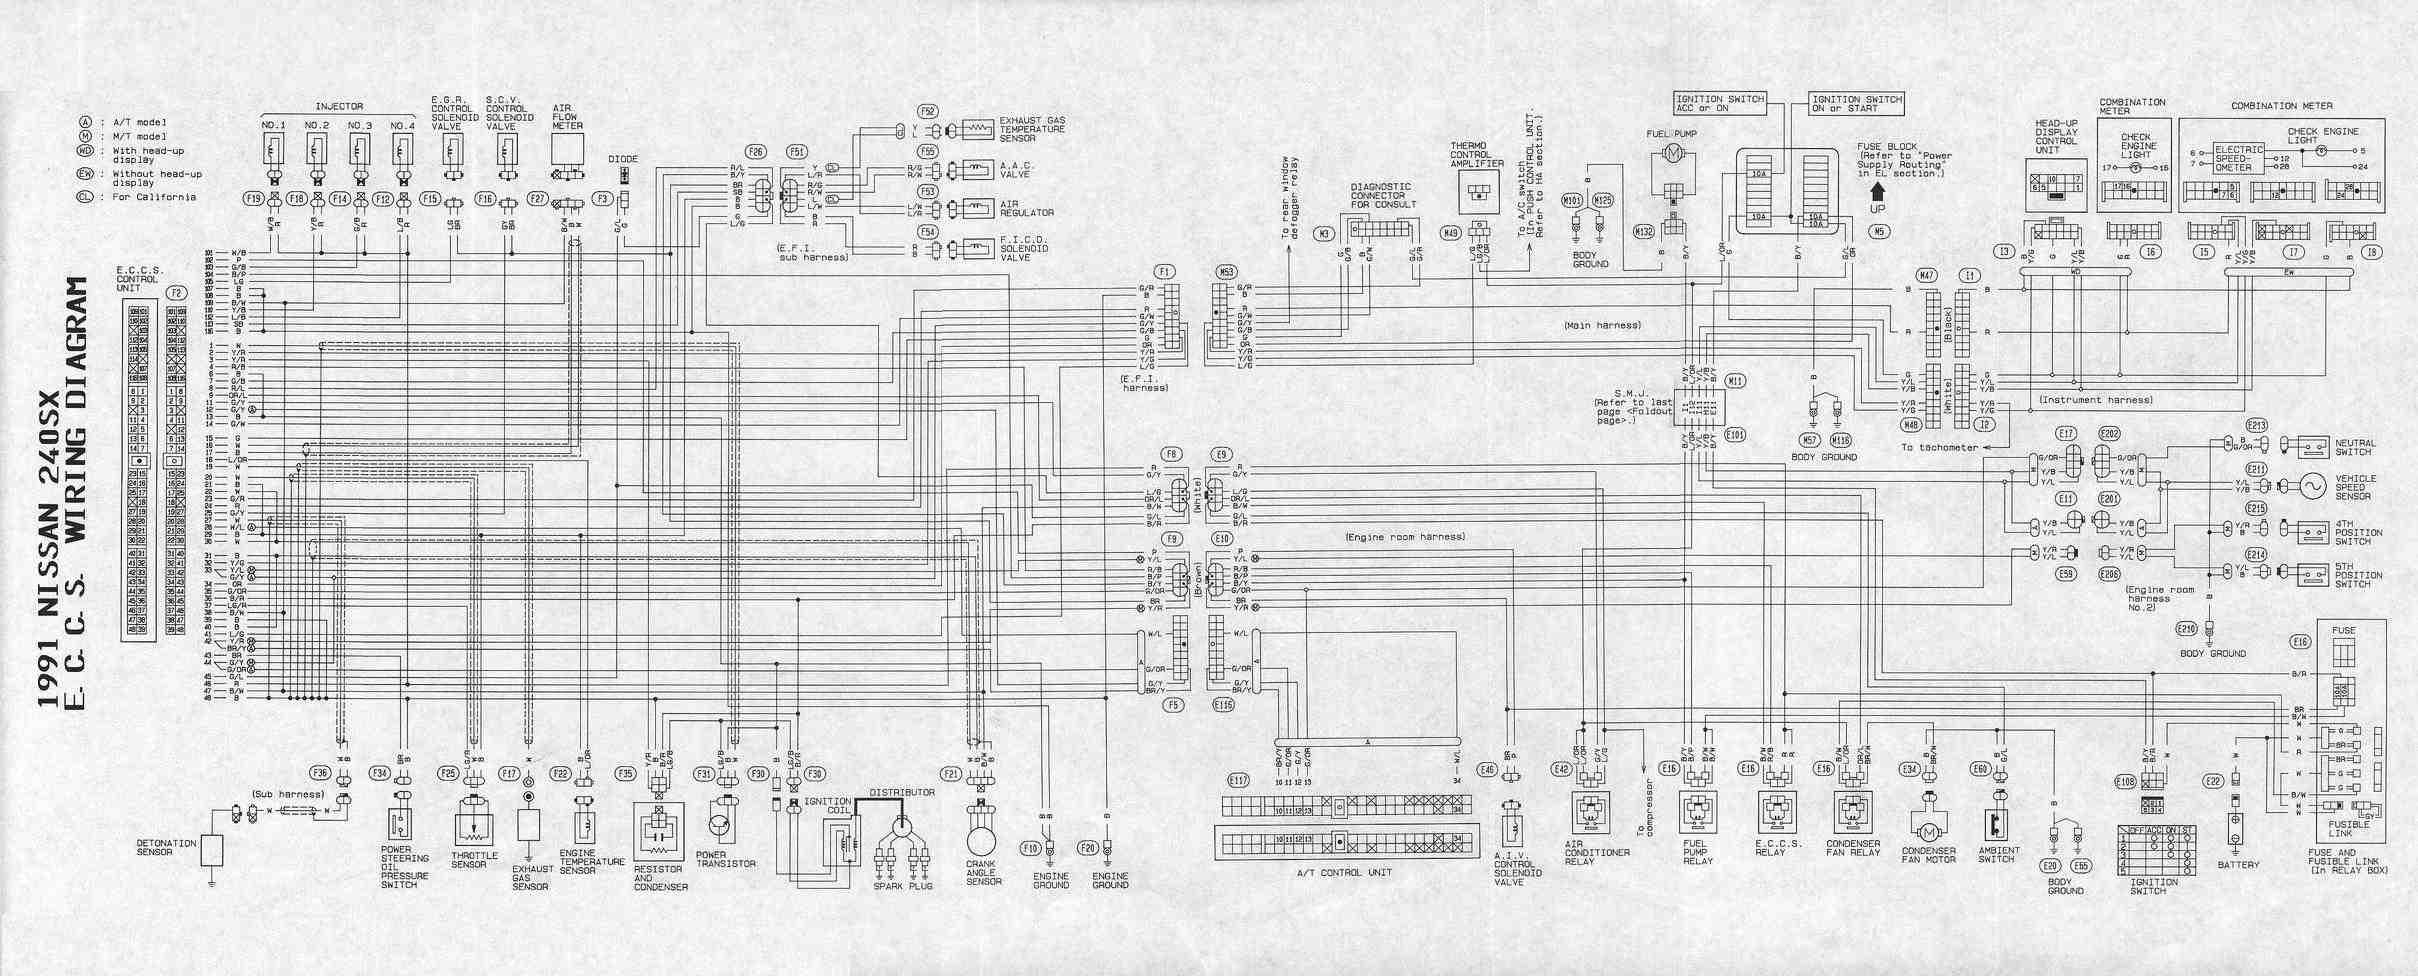 medium resolution of captivating nissan micra k12 wiring diagram pdf photos best image nissan micra 2003 fuse box diagram